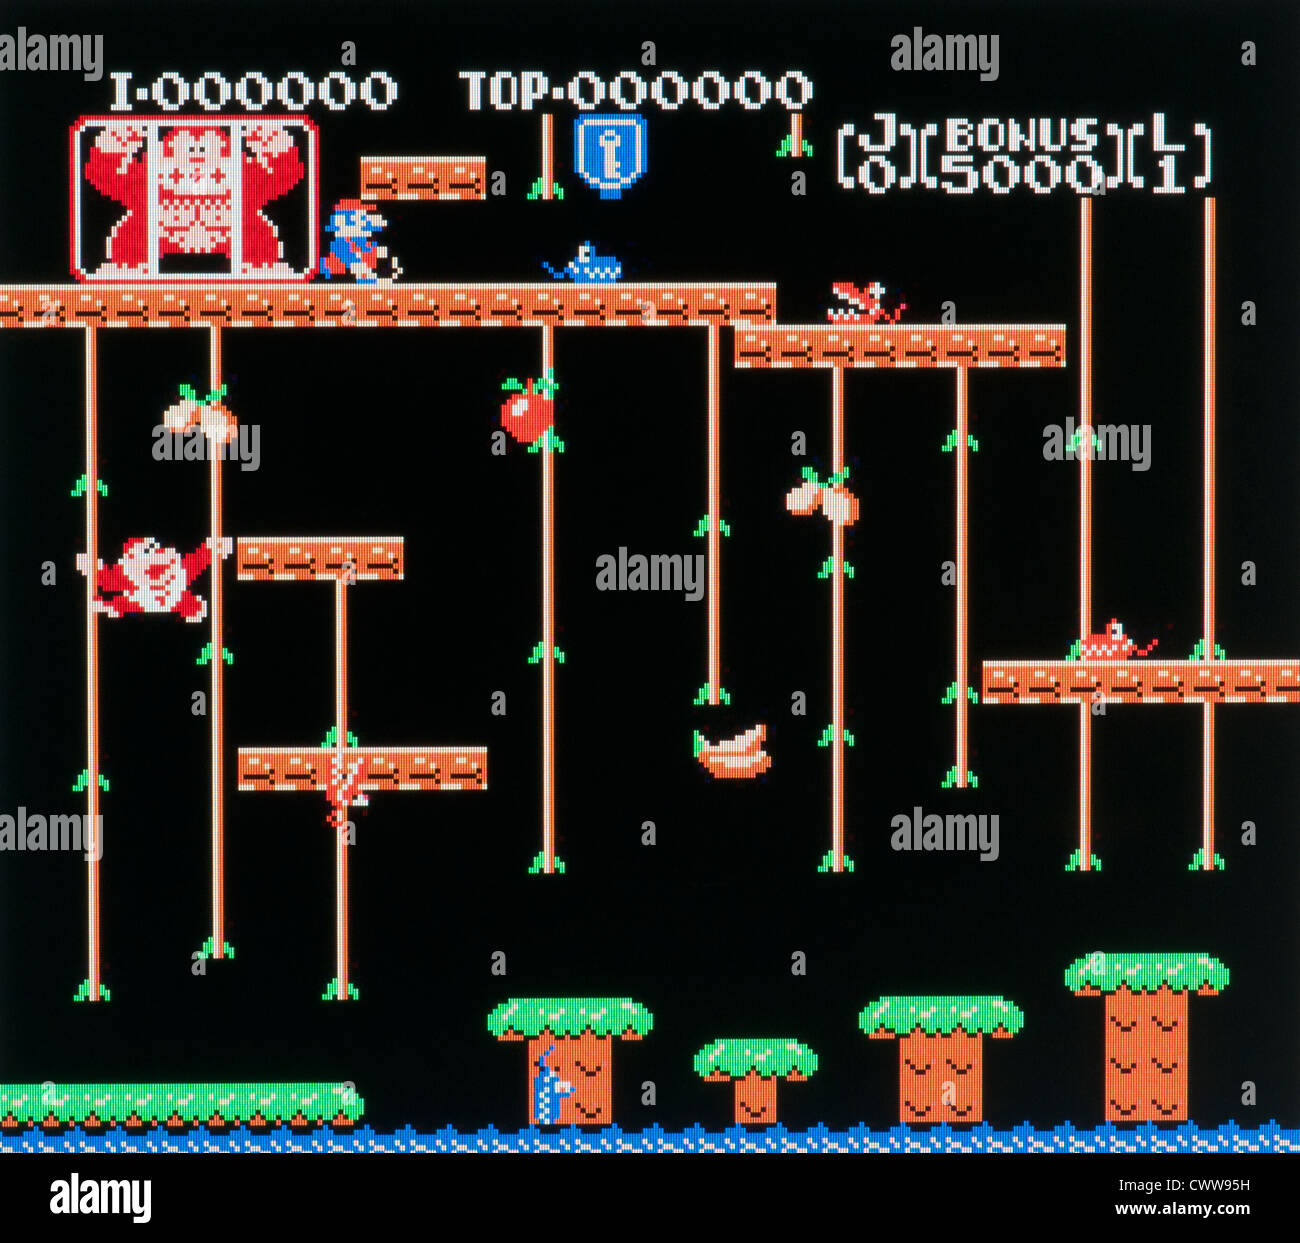 Donkey Kong arcade video game - Stock Image